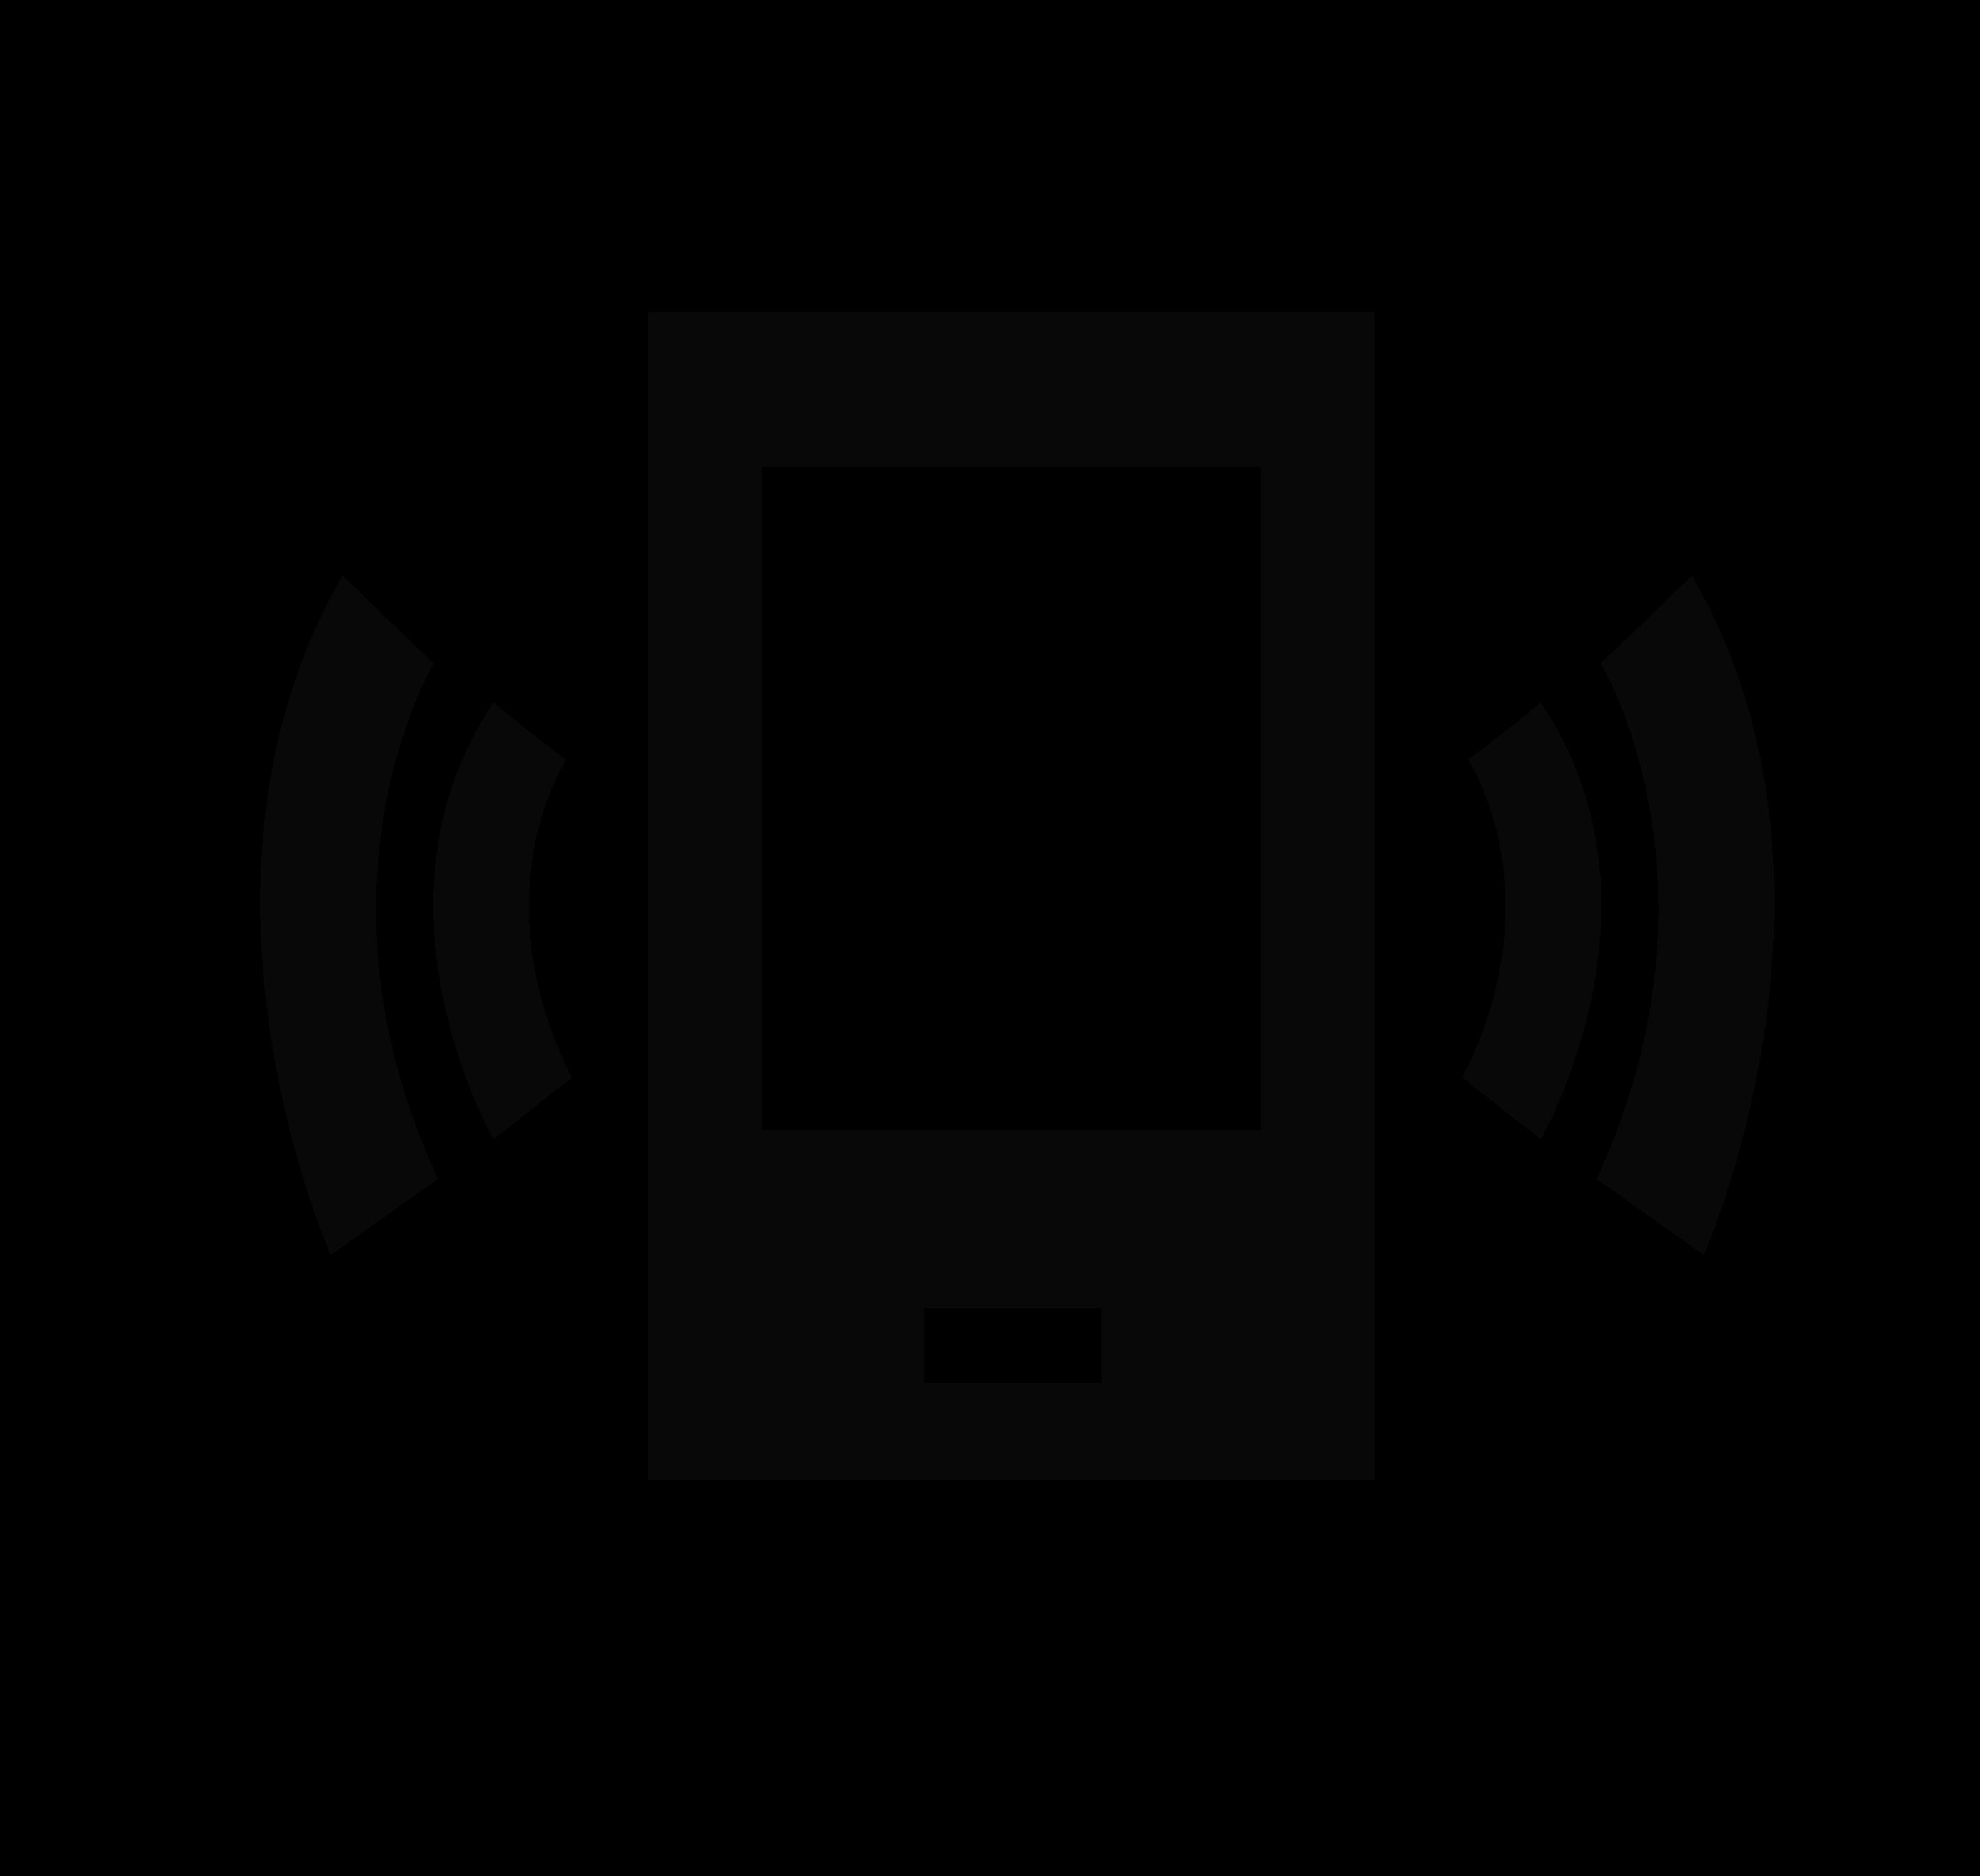 [PROMO] AON 300GB